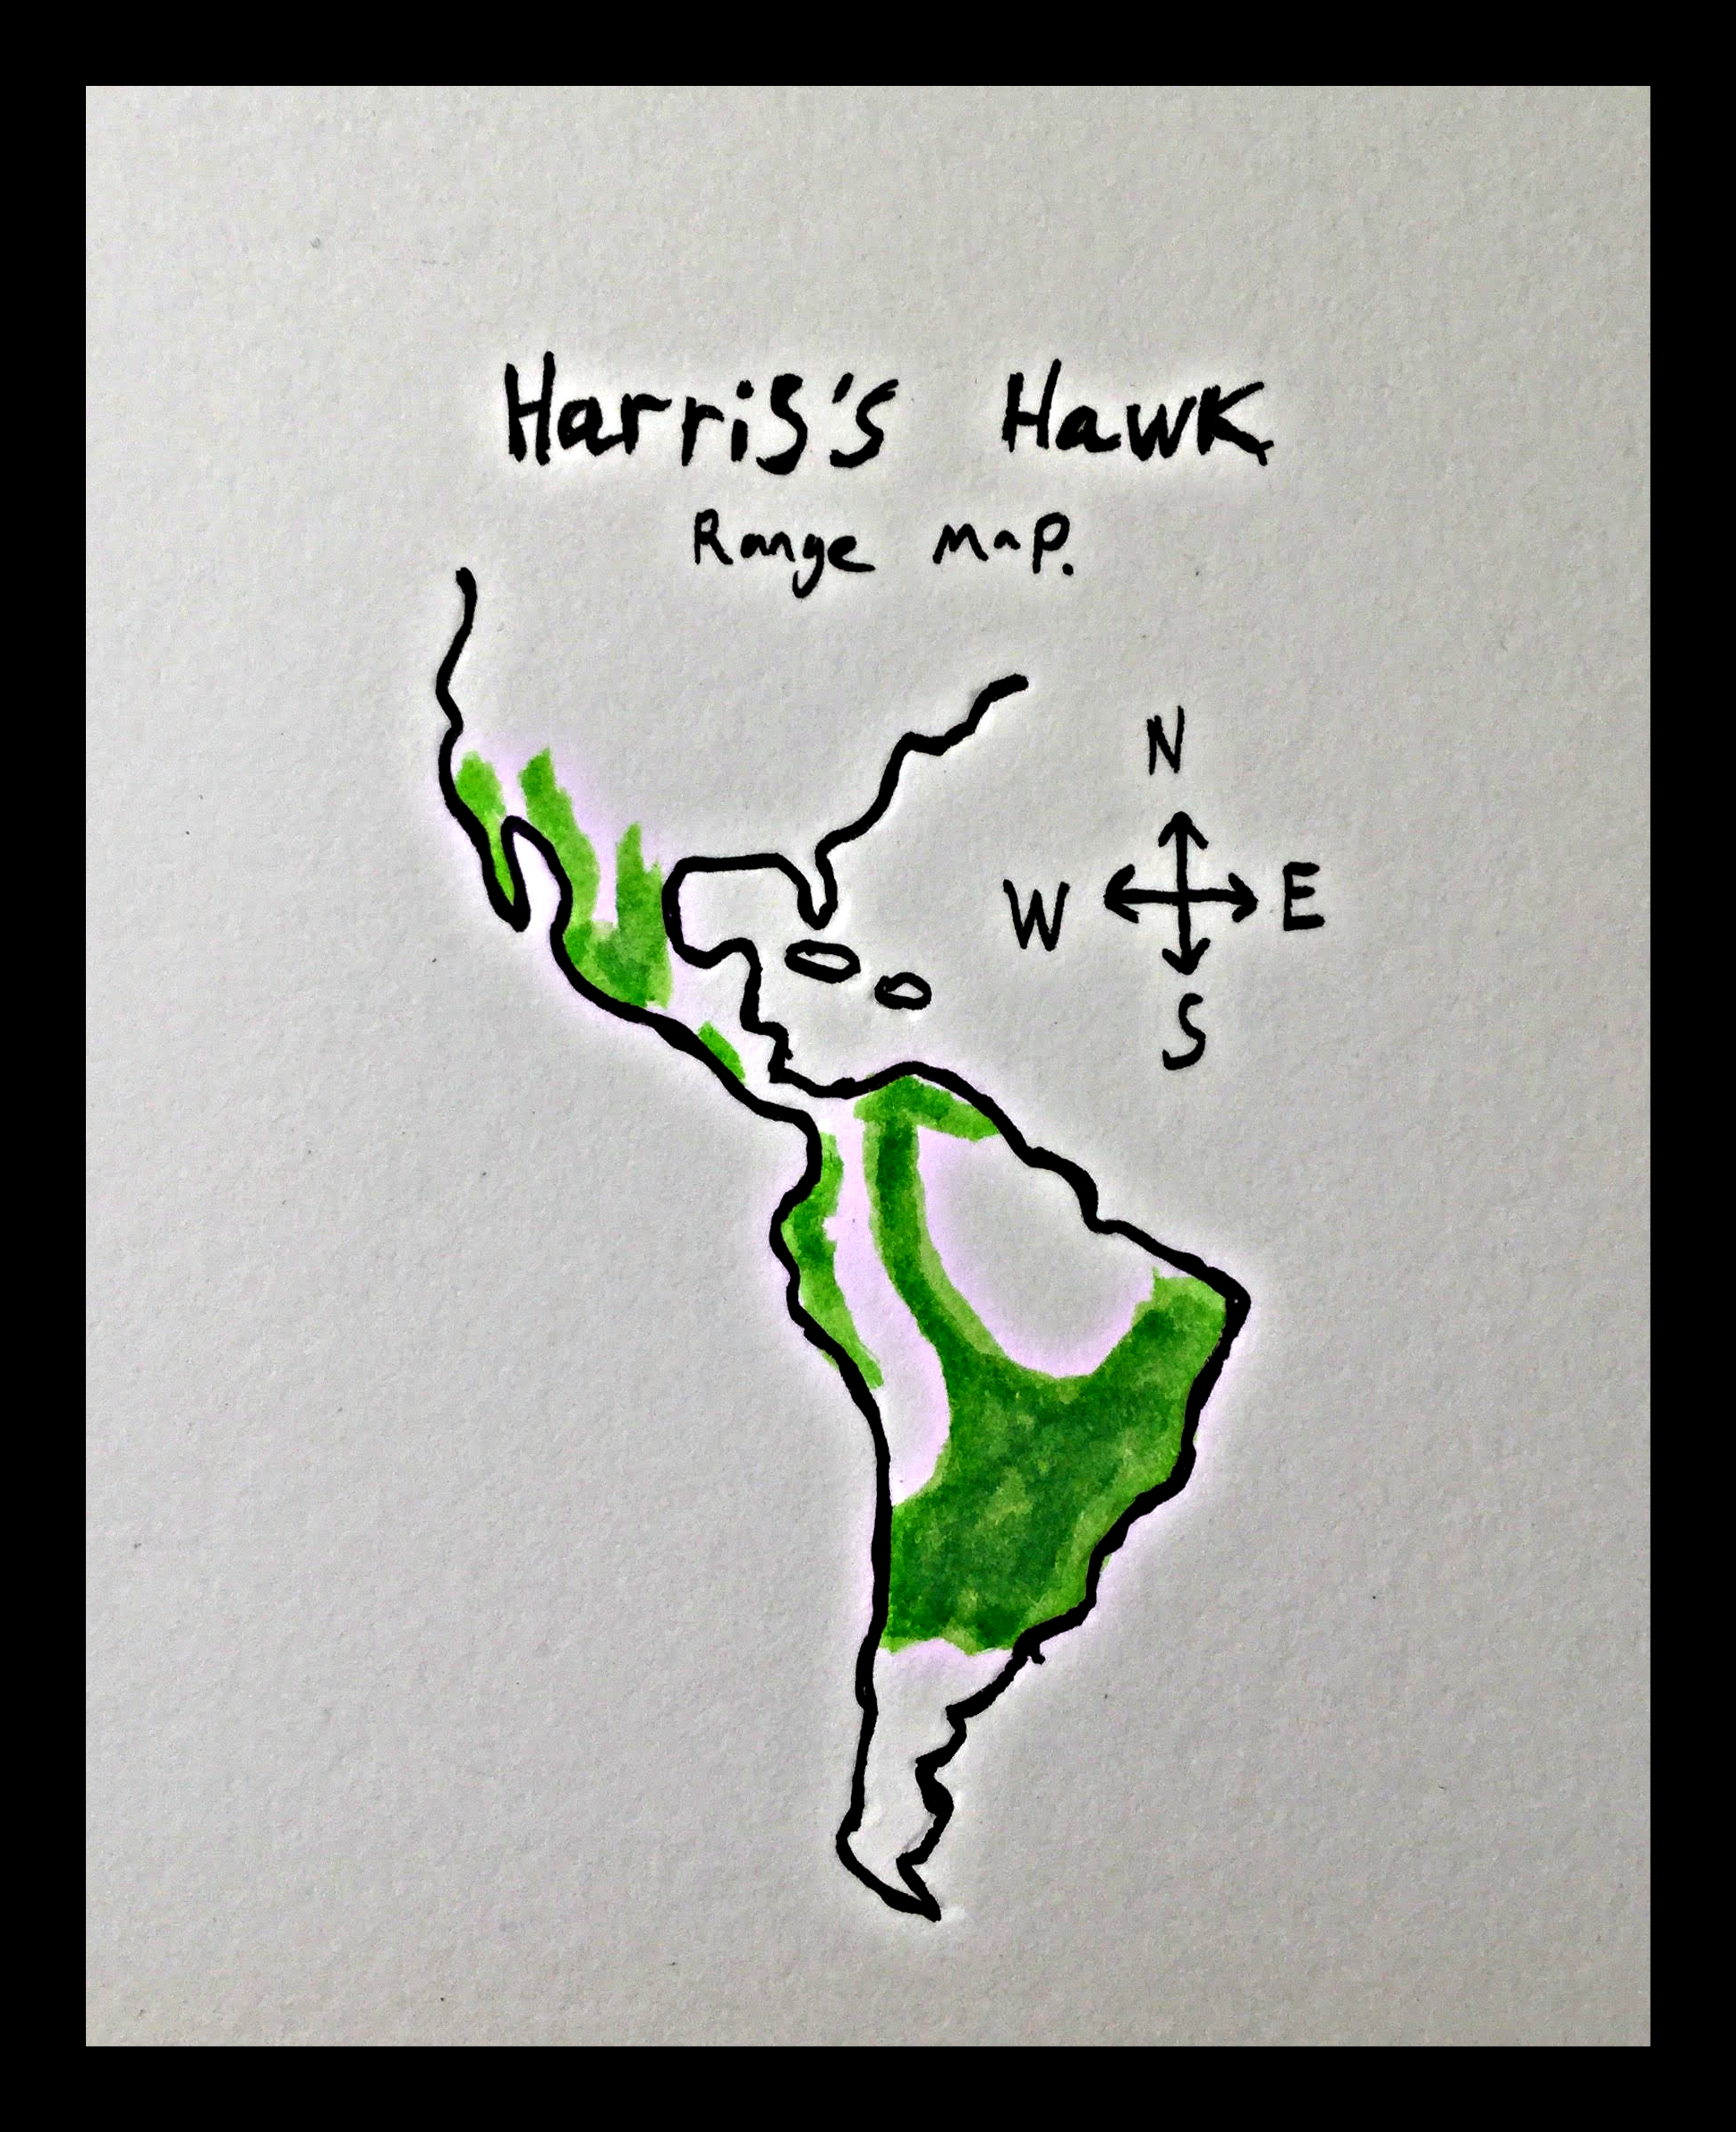 Hariss hawk map